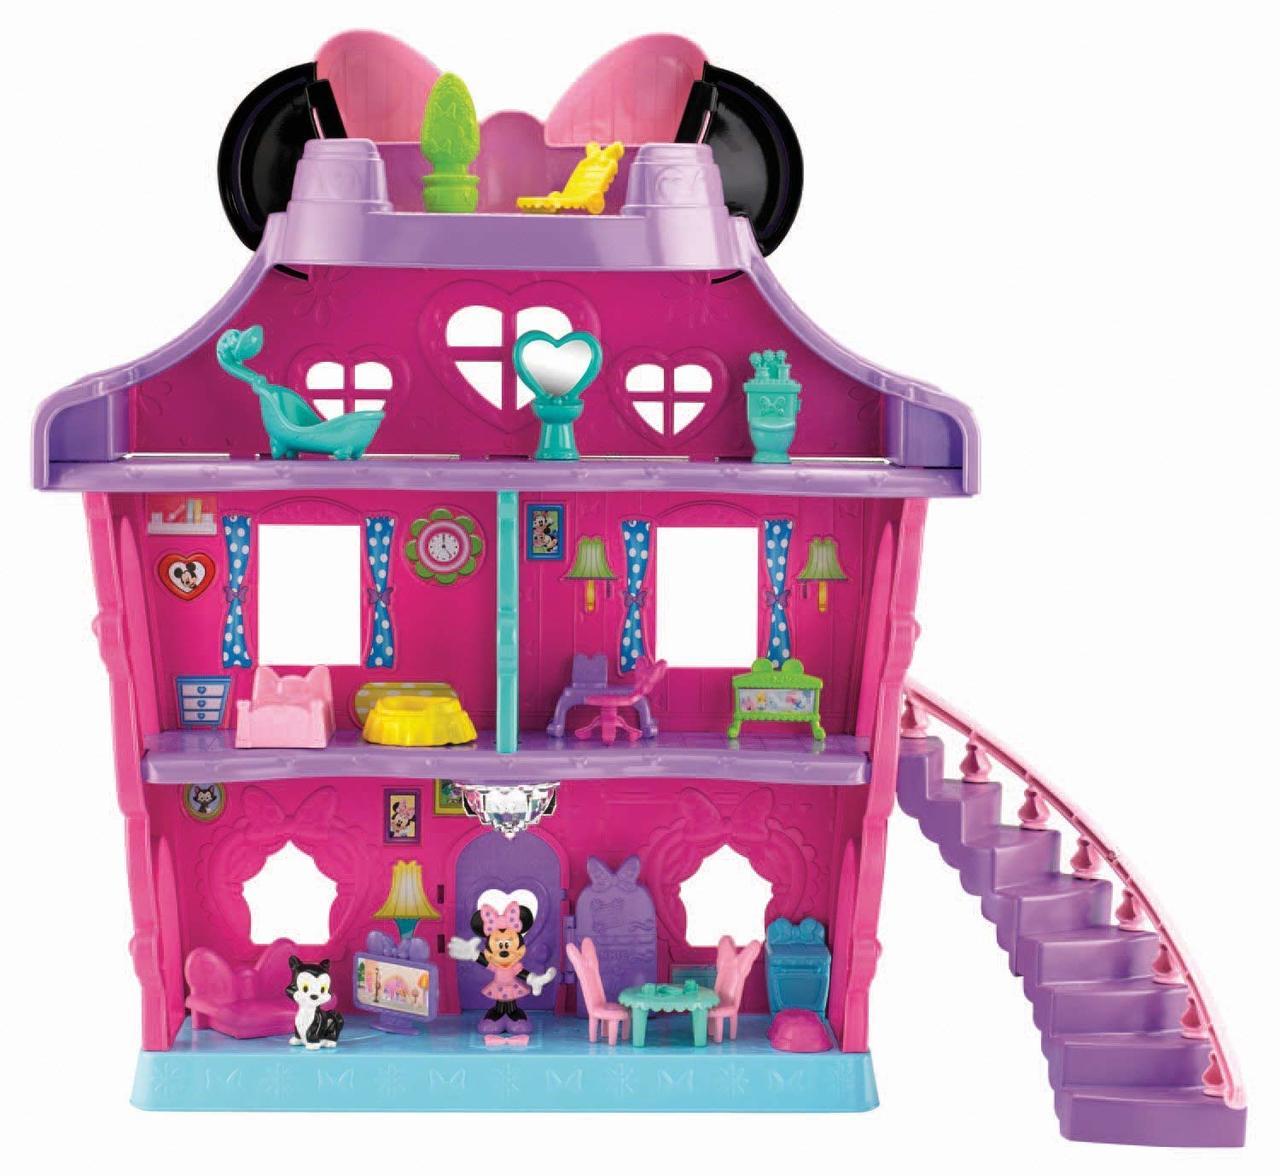 e696ec014bca1 Fisherprice Disney Minnie Mouse Minnie'S Magical Bow-Sweet Mansion ...